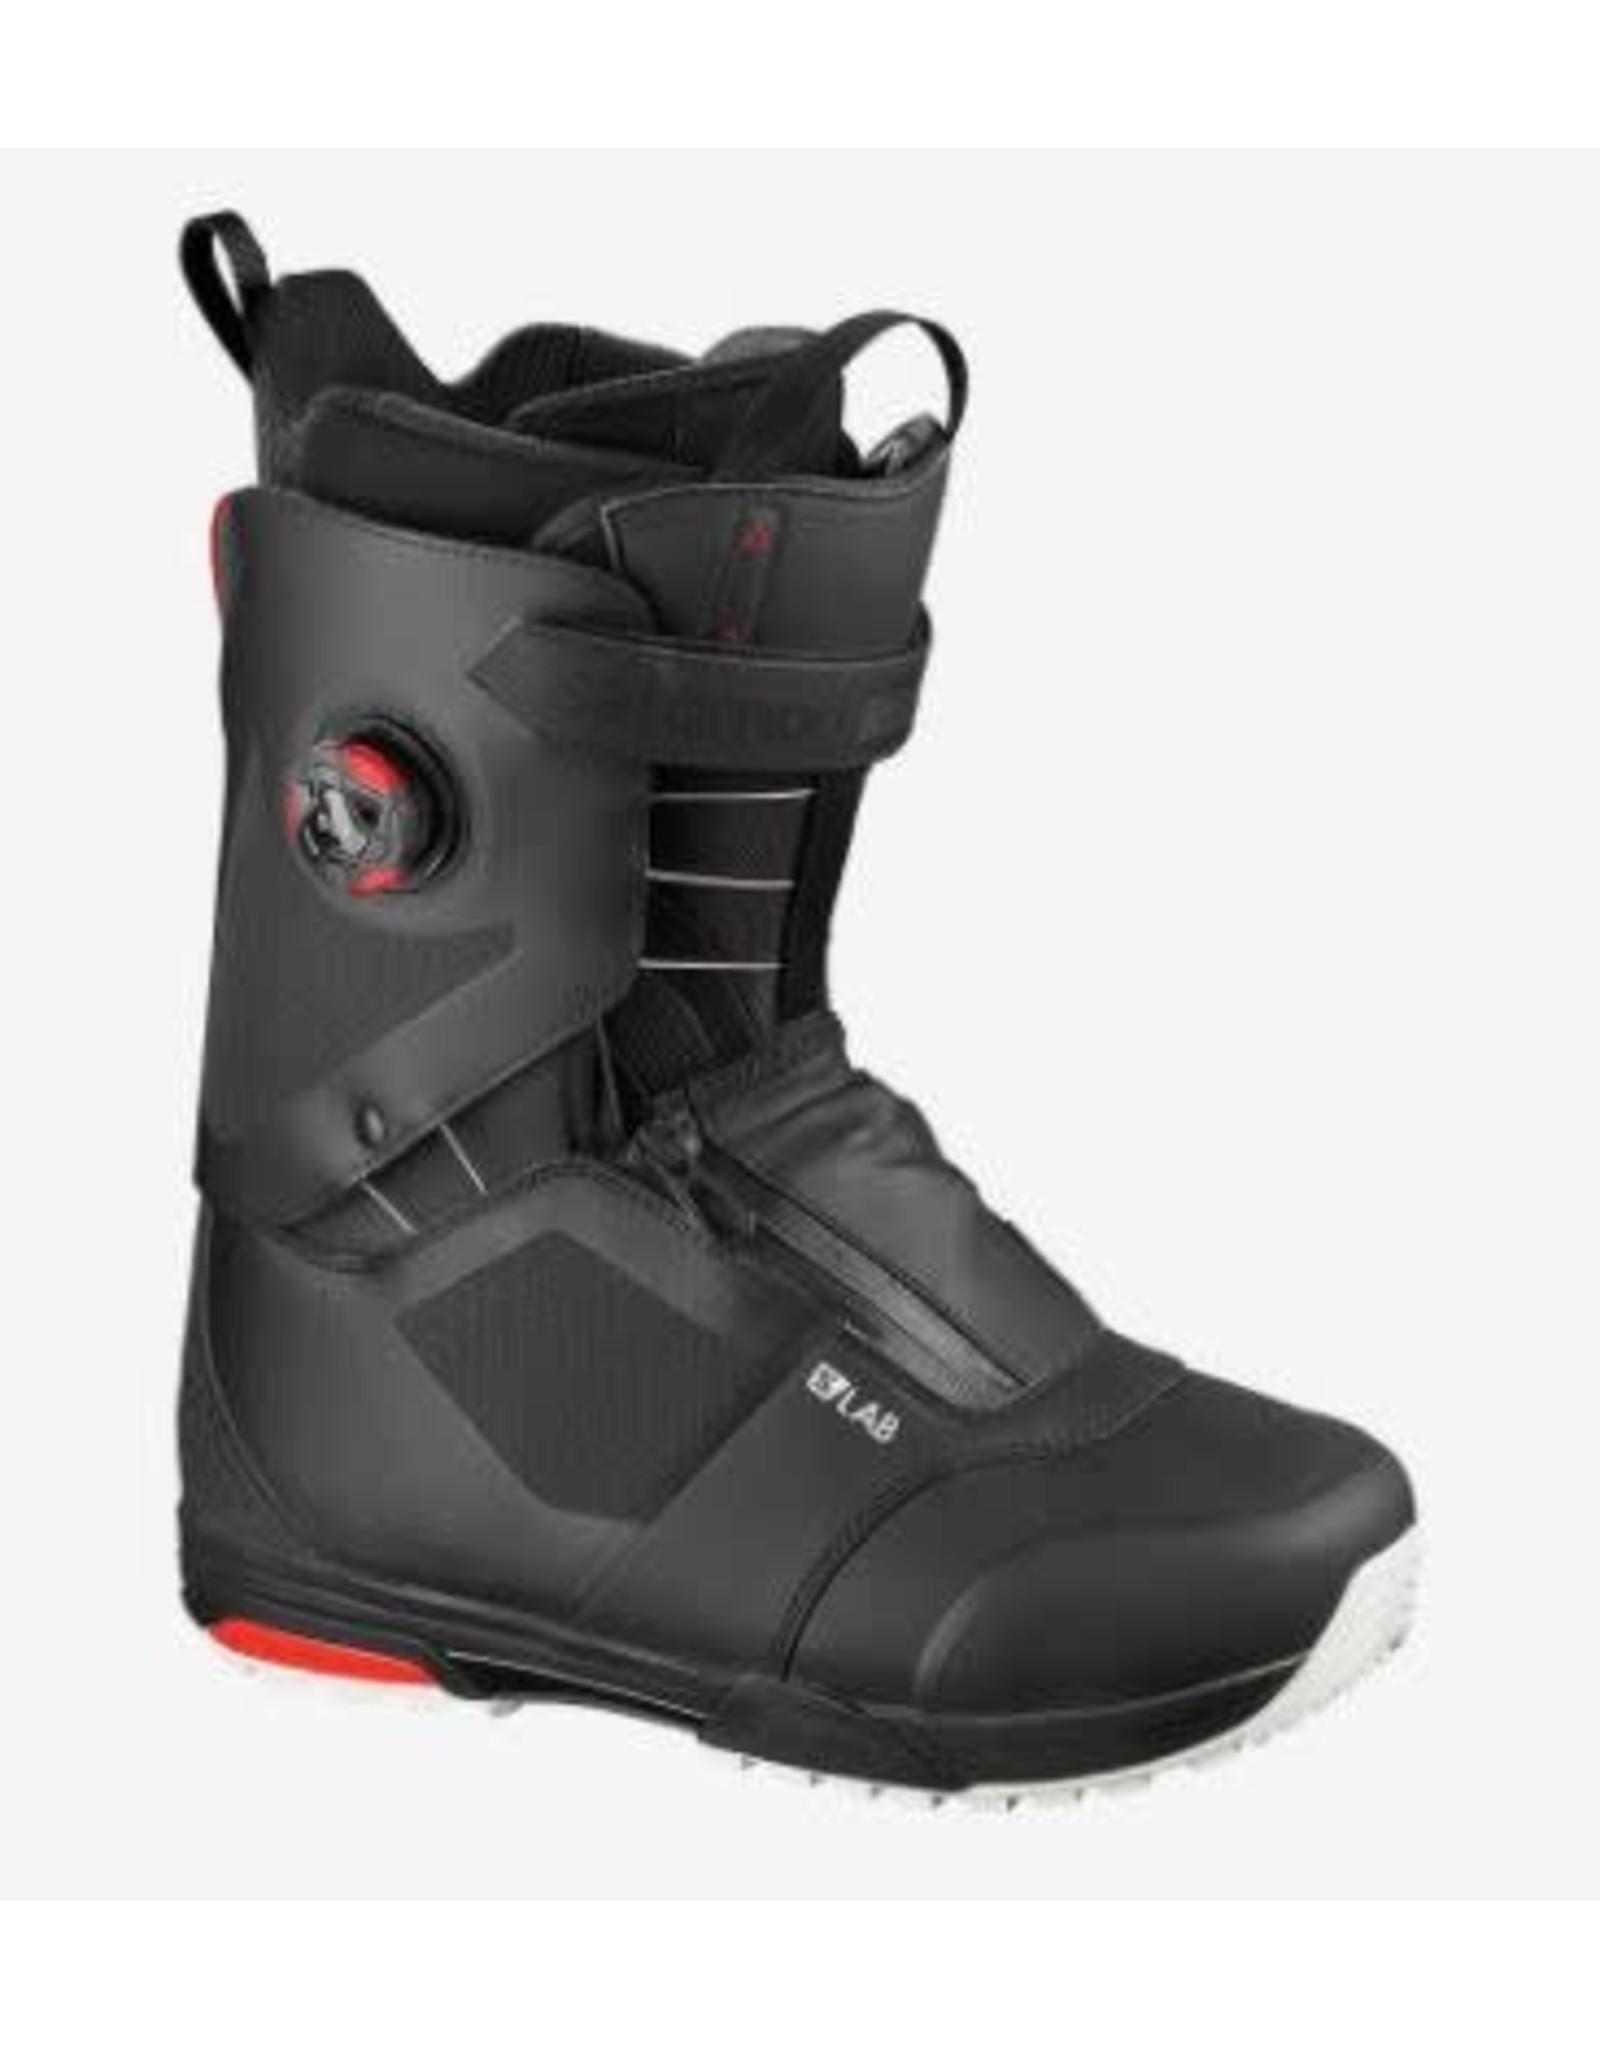 salomon Salomon - Botte splitboard homme trek s/lab black/racing red/black